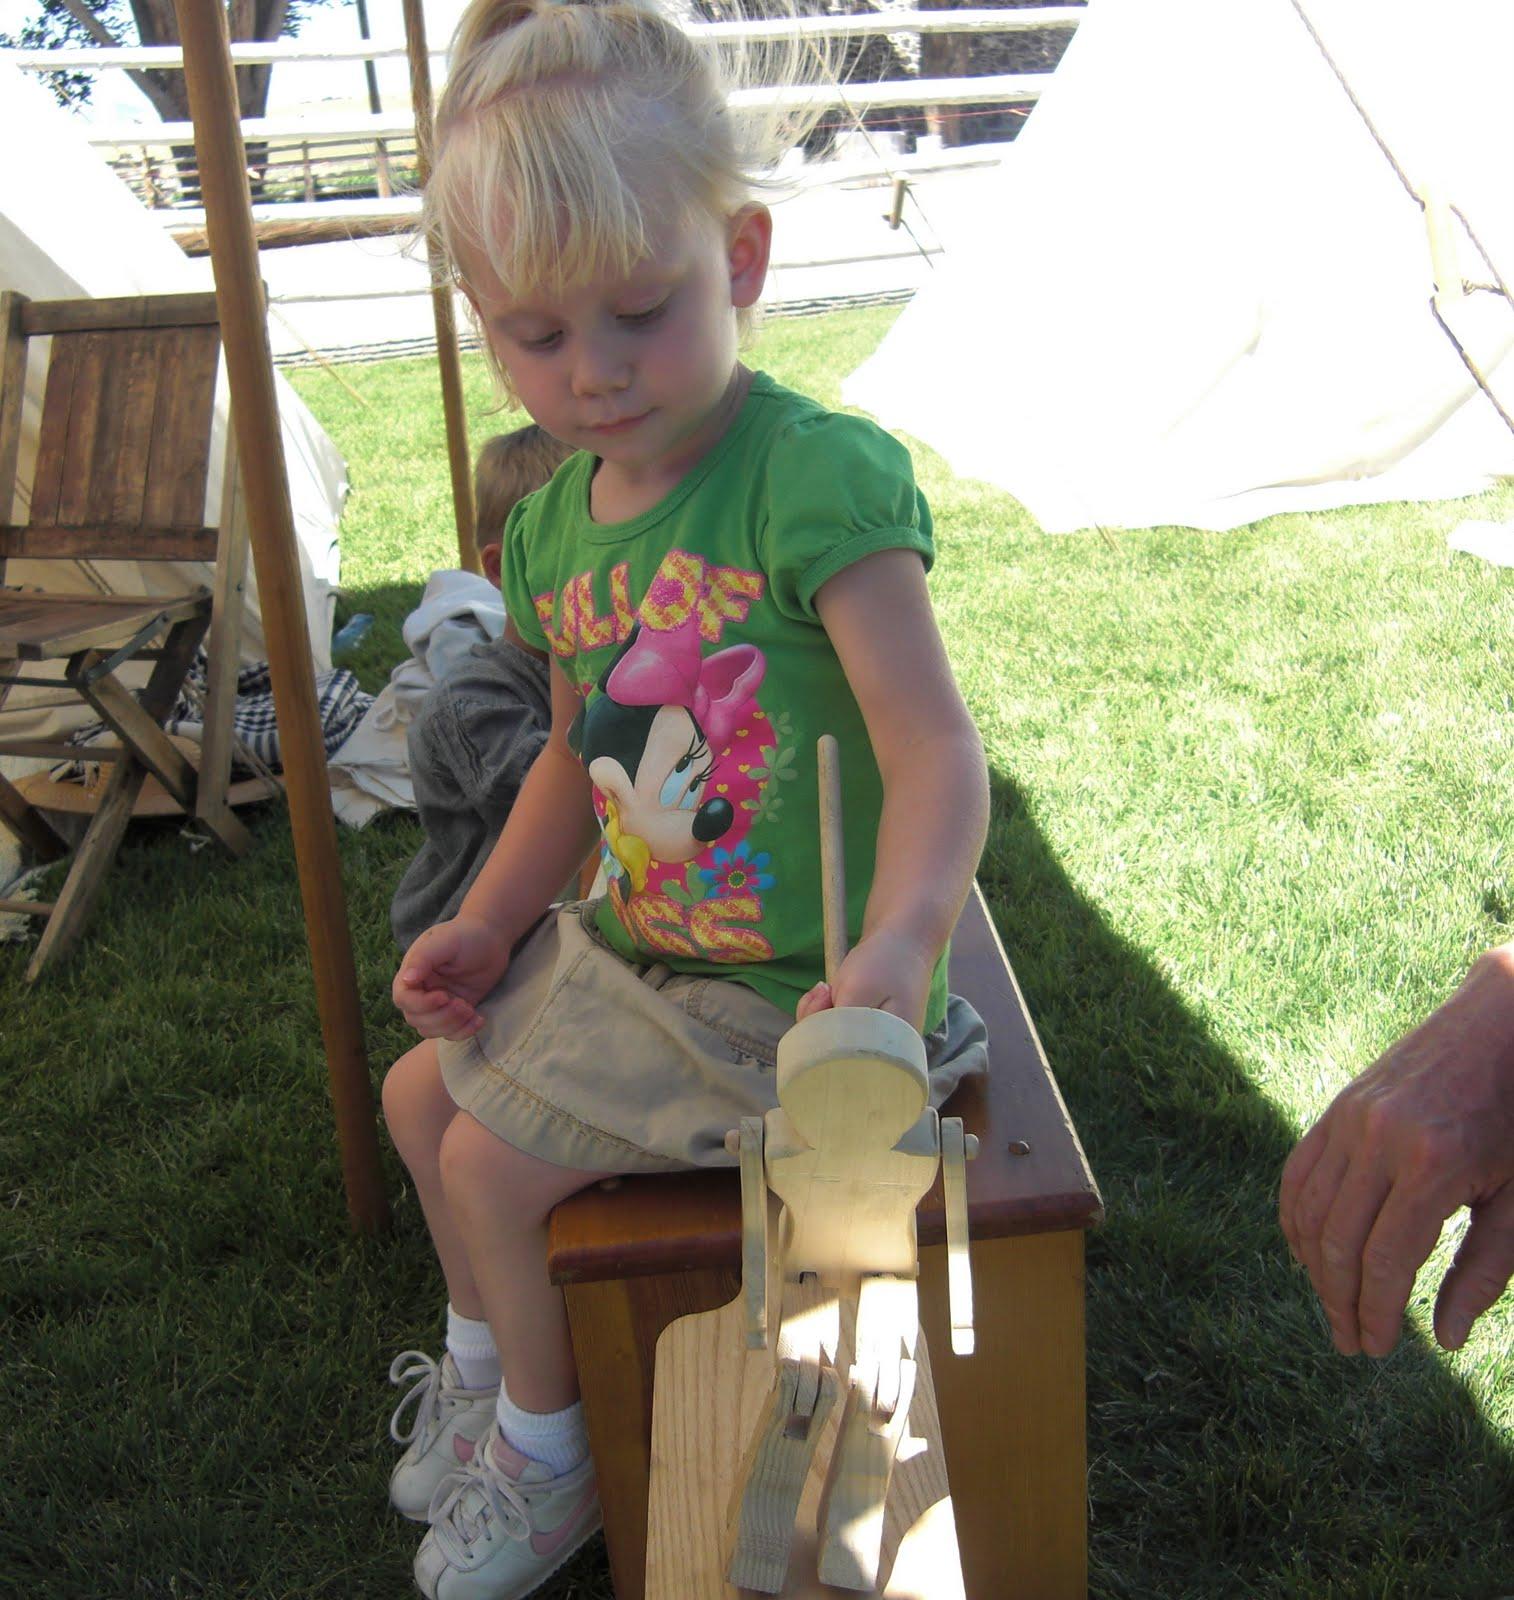 littlegirl tied up Little A had fun trying to make the wooden man jump.